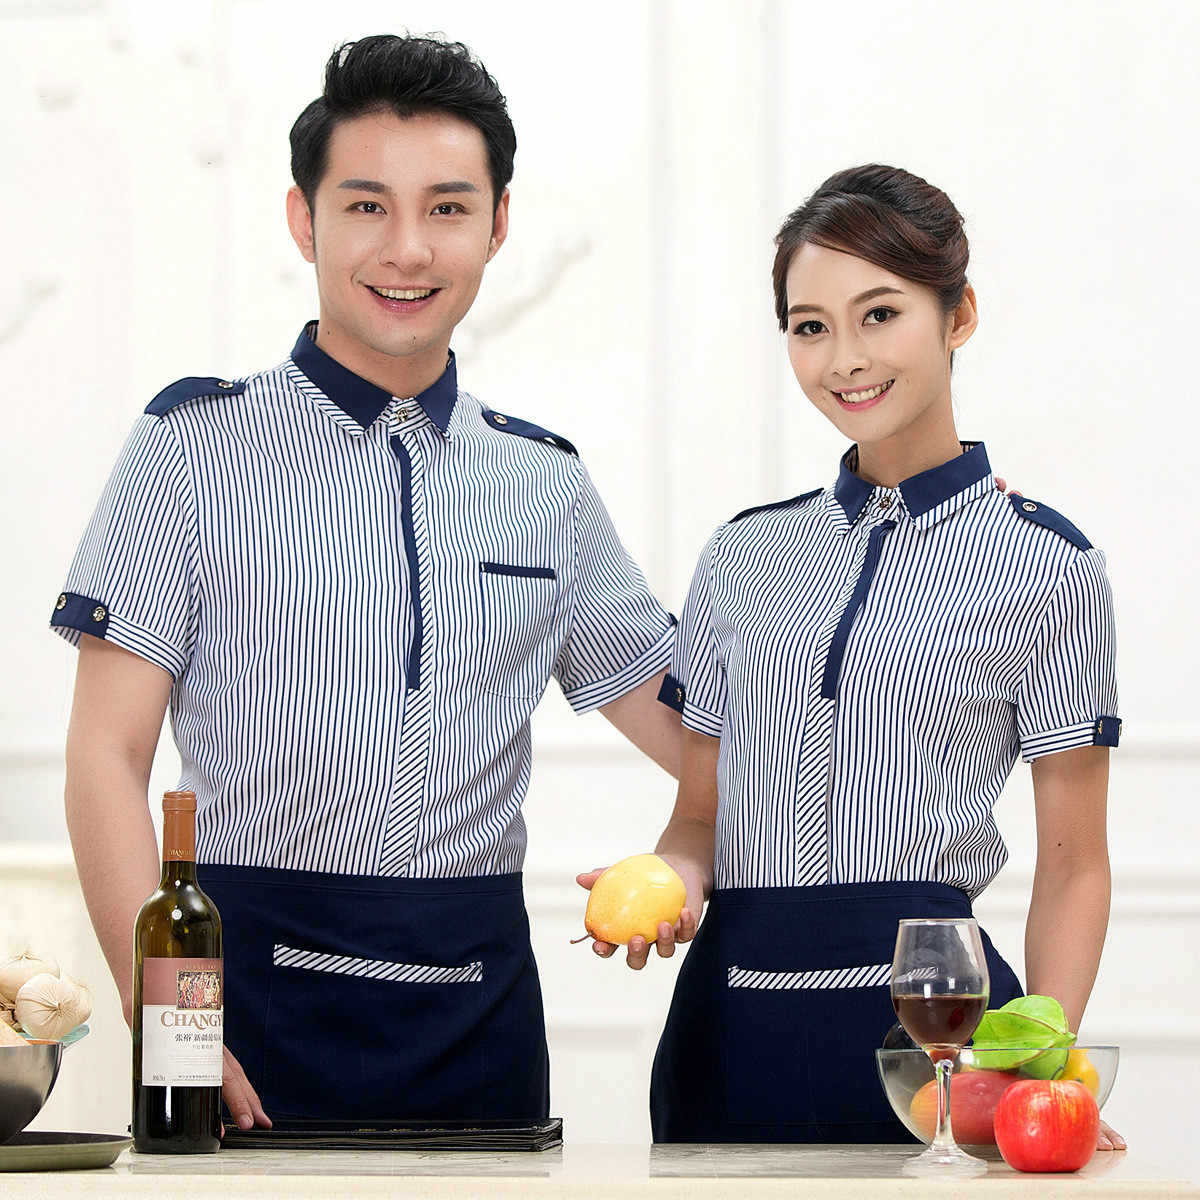 Zomer Restaurant Food Service Ober Uniform Mannen Cafe Chef Uniform Vrouwen Hotel Serveerster Uniform Koffie Winkel Personeel Overalls